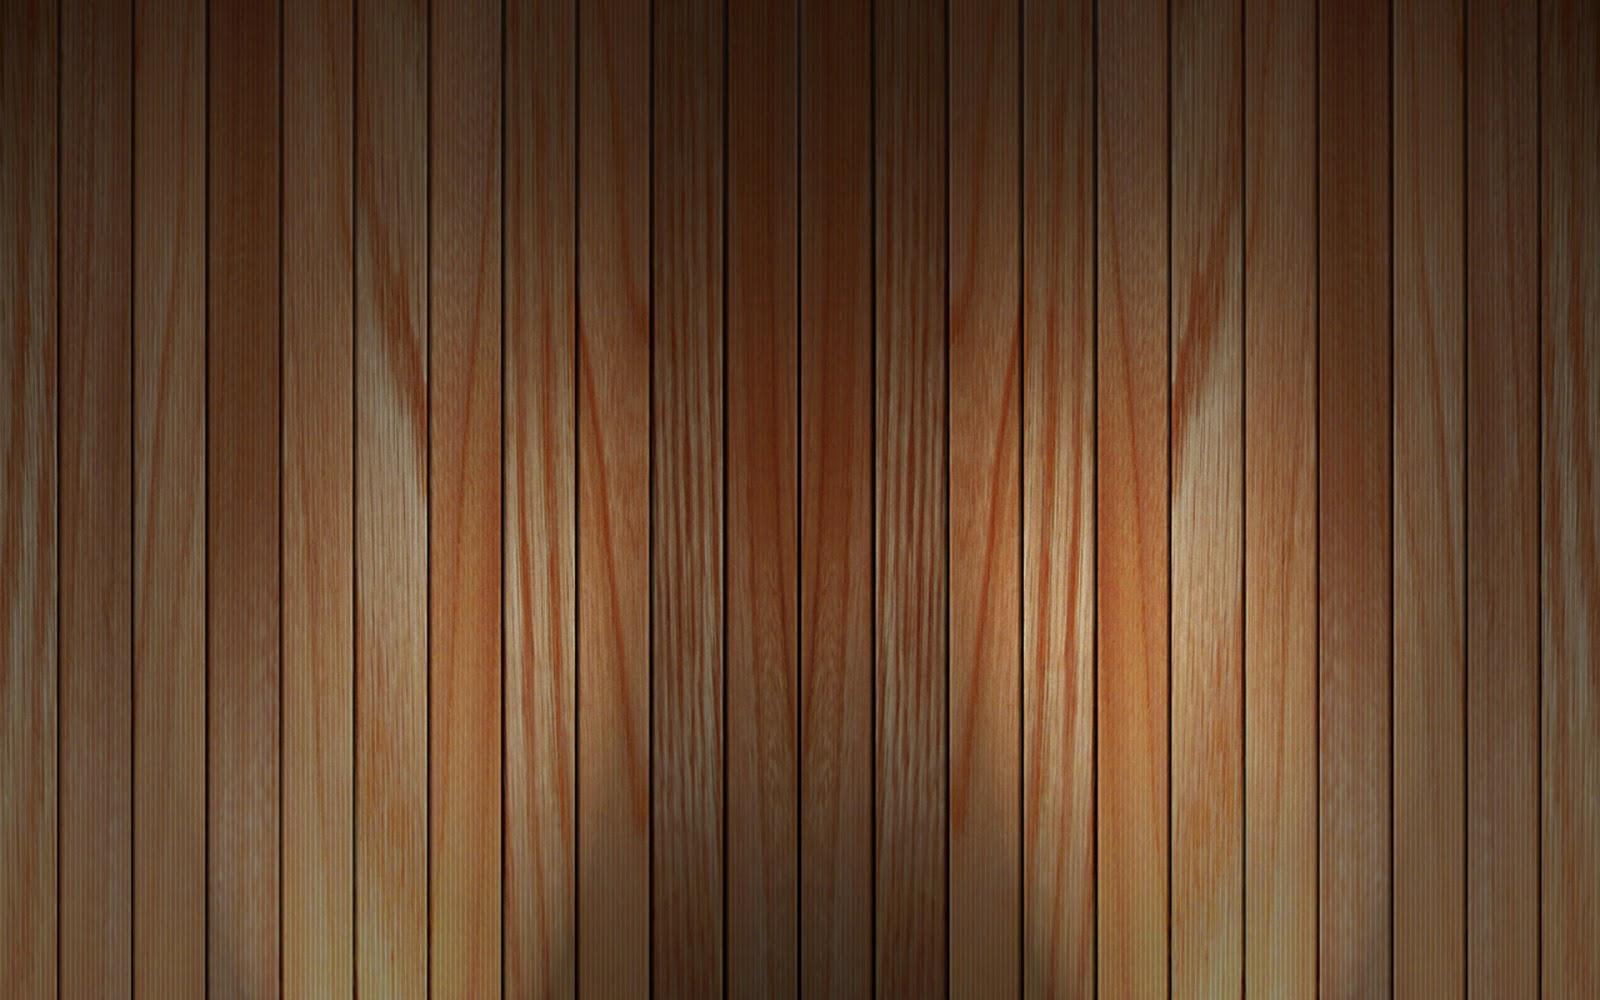 Hd Wallpaper Wood